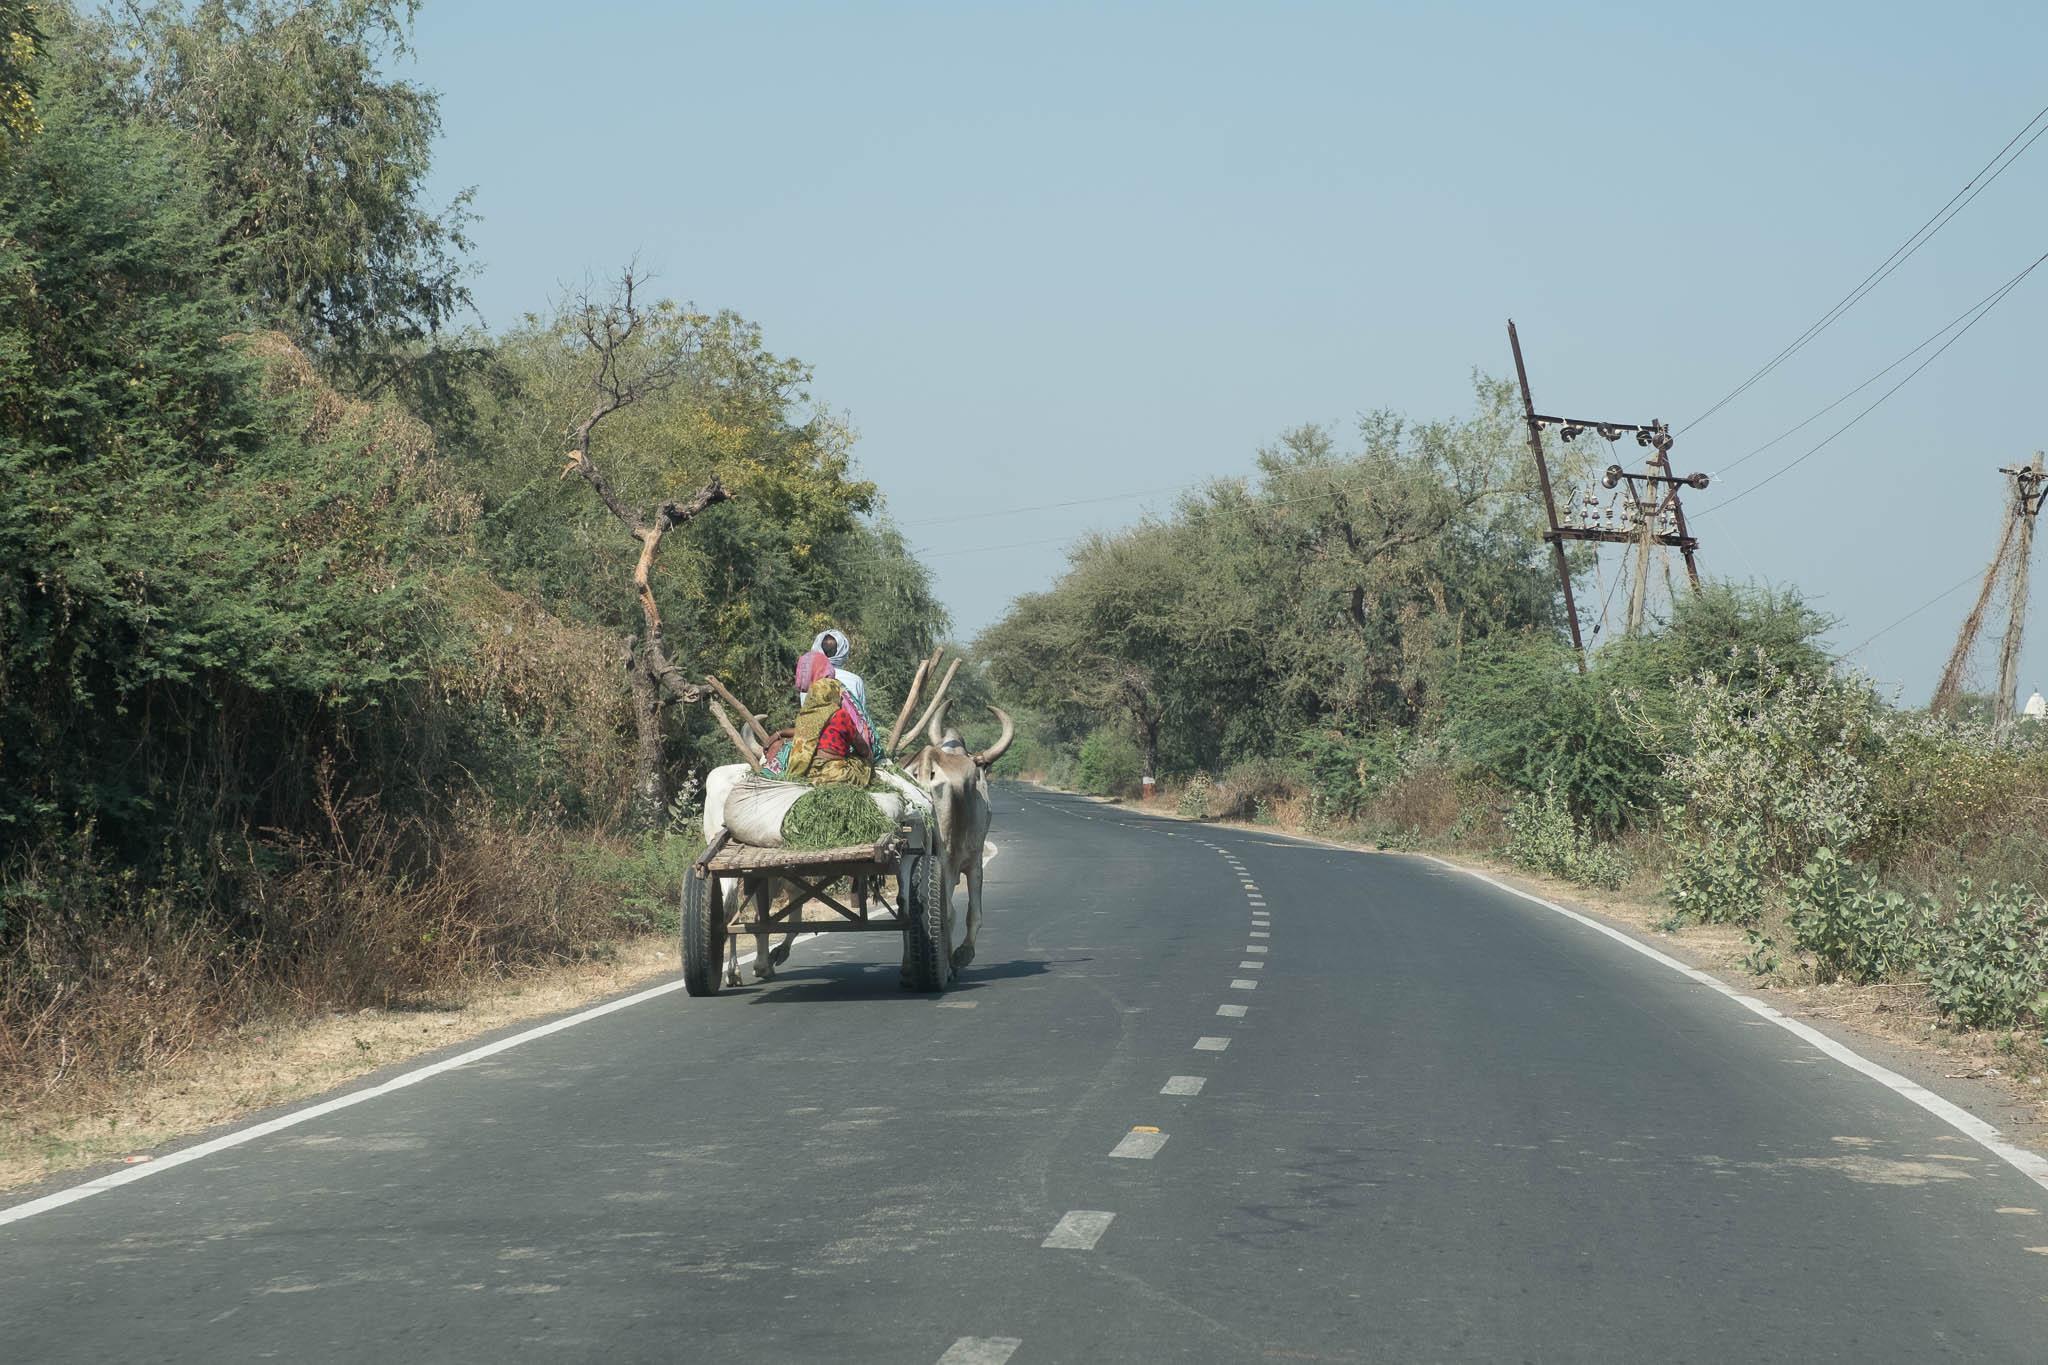 India-2017-7220.jpg